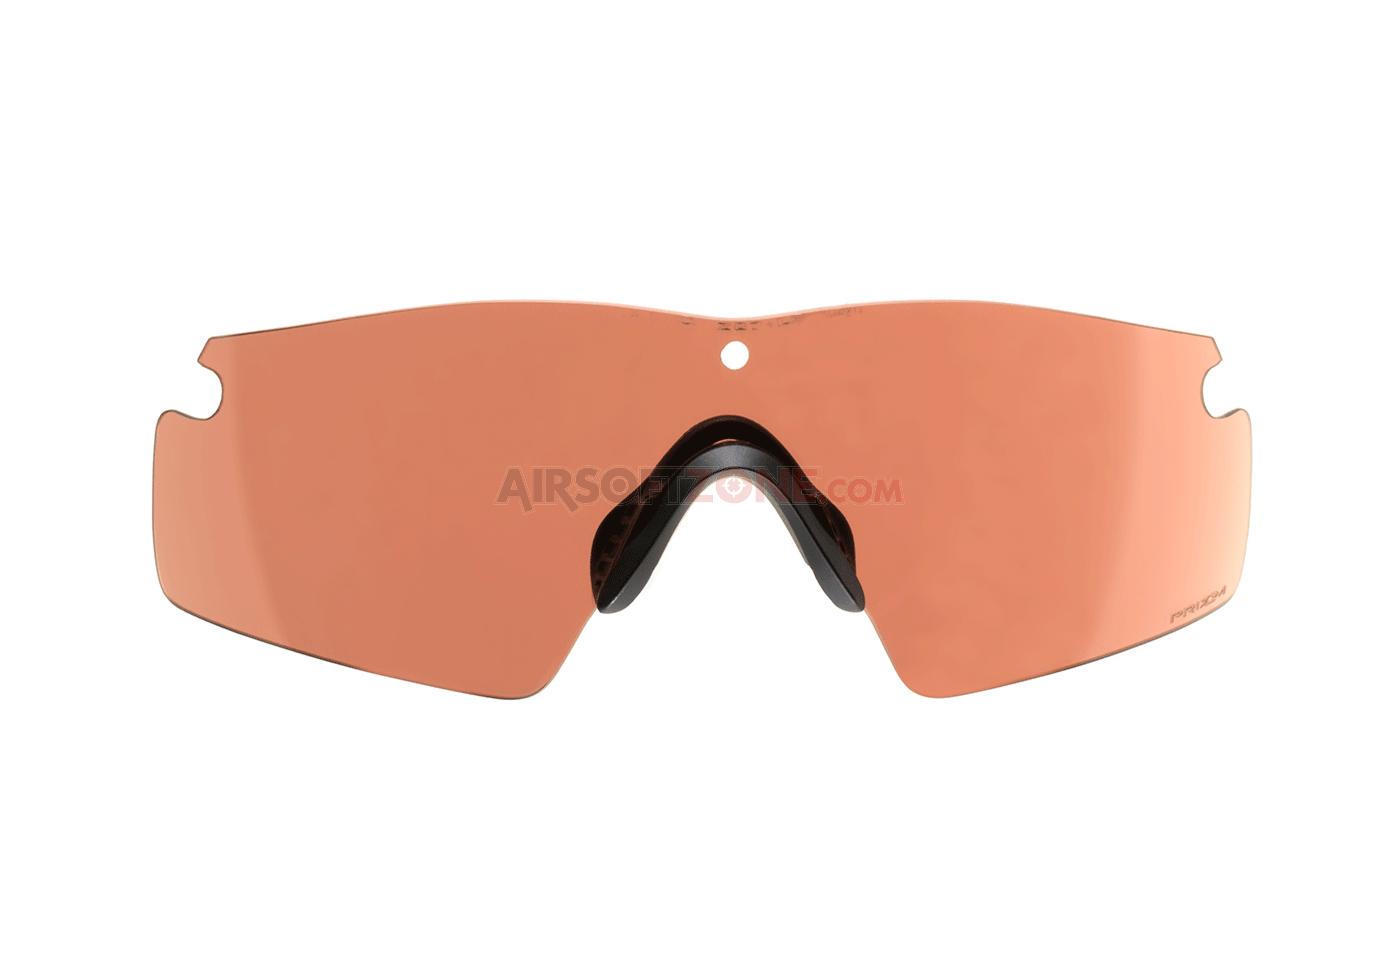 a4a5447cb0 Oakley Si M Frame 3.0 Balck